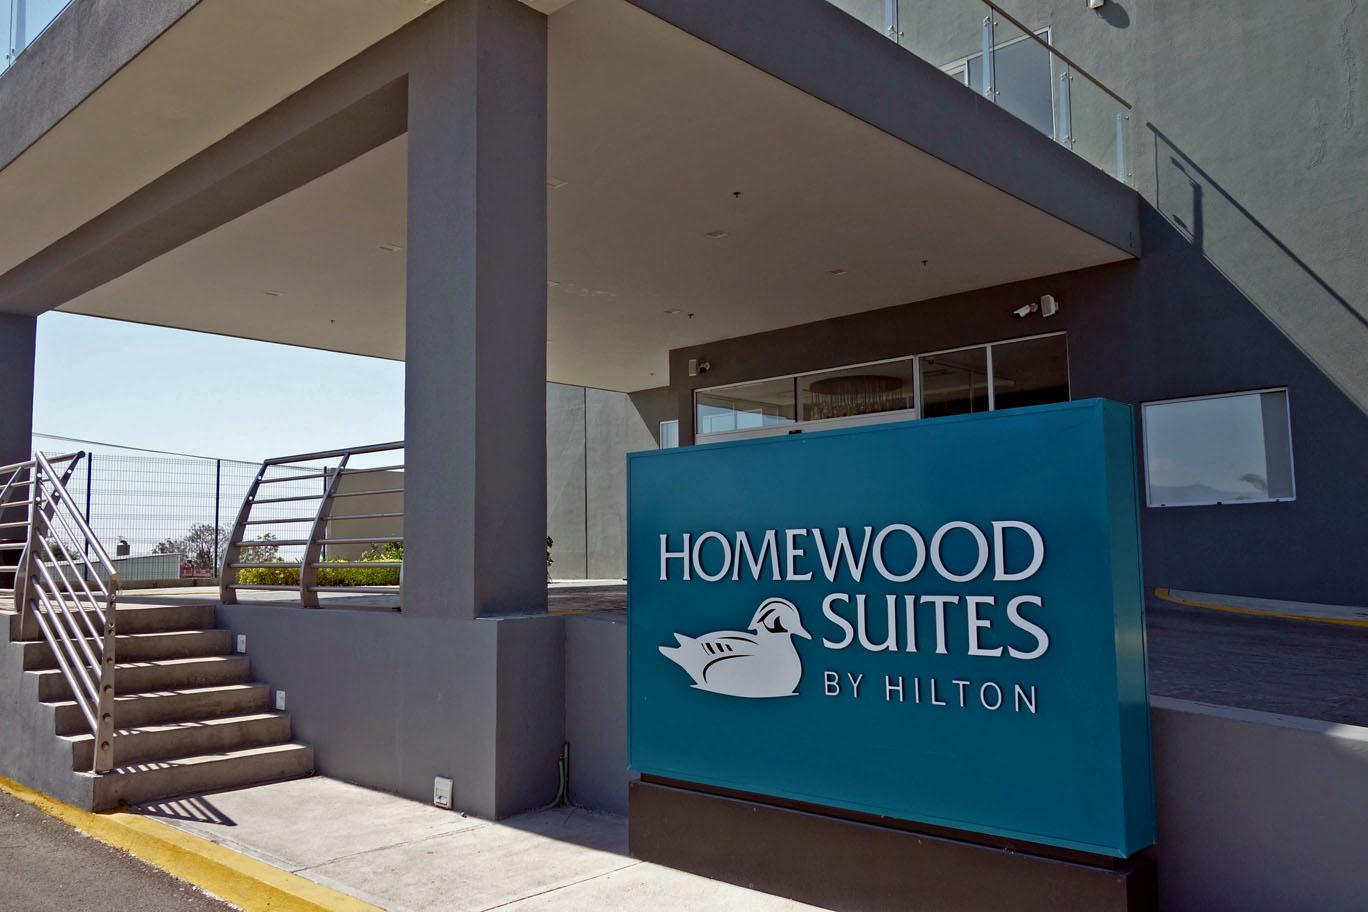 Hilton продлевает срок действия статуса (и другие новости)